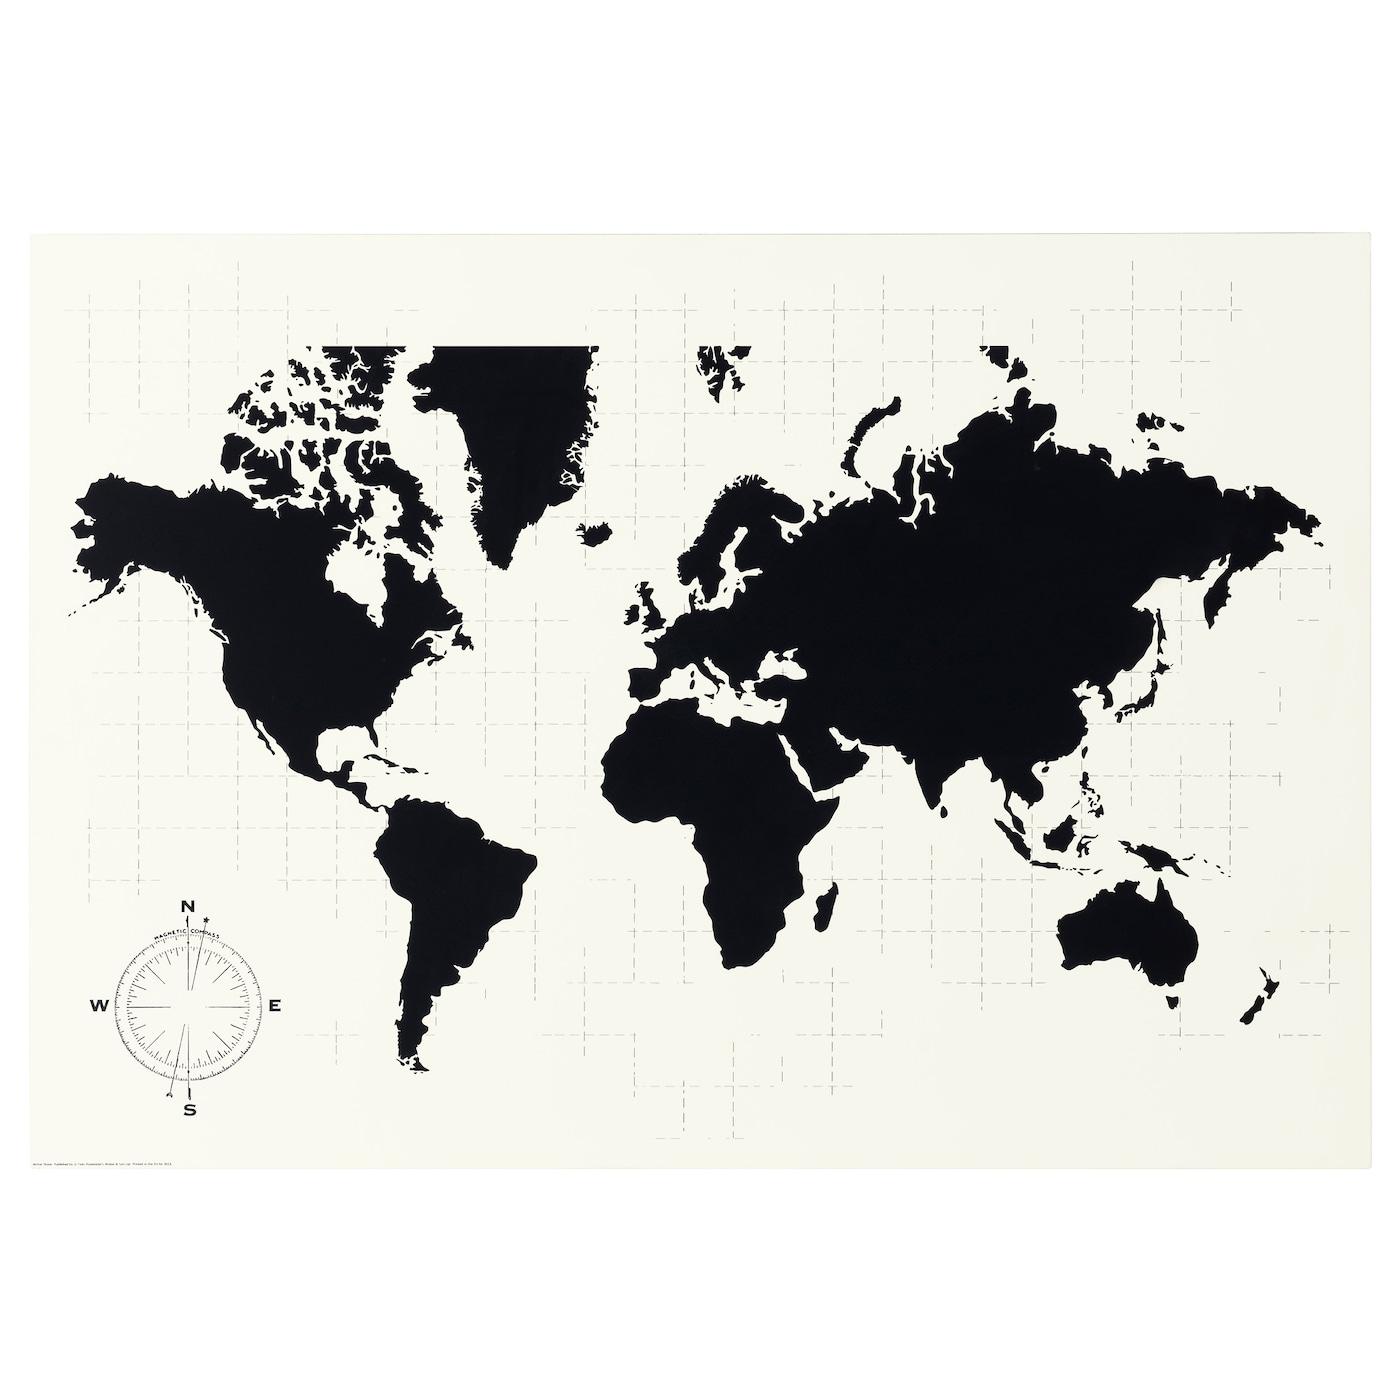 ikea lisboa mapa Cuadros y Láminas Enmarcadas   Decoración   Compra Online IKEA ikea lisboa mapa